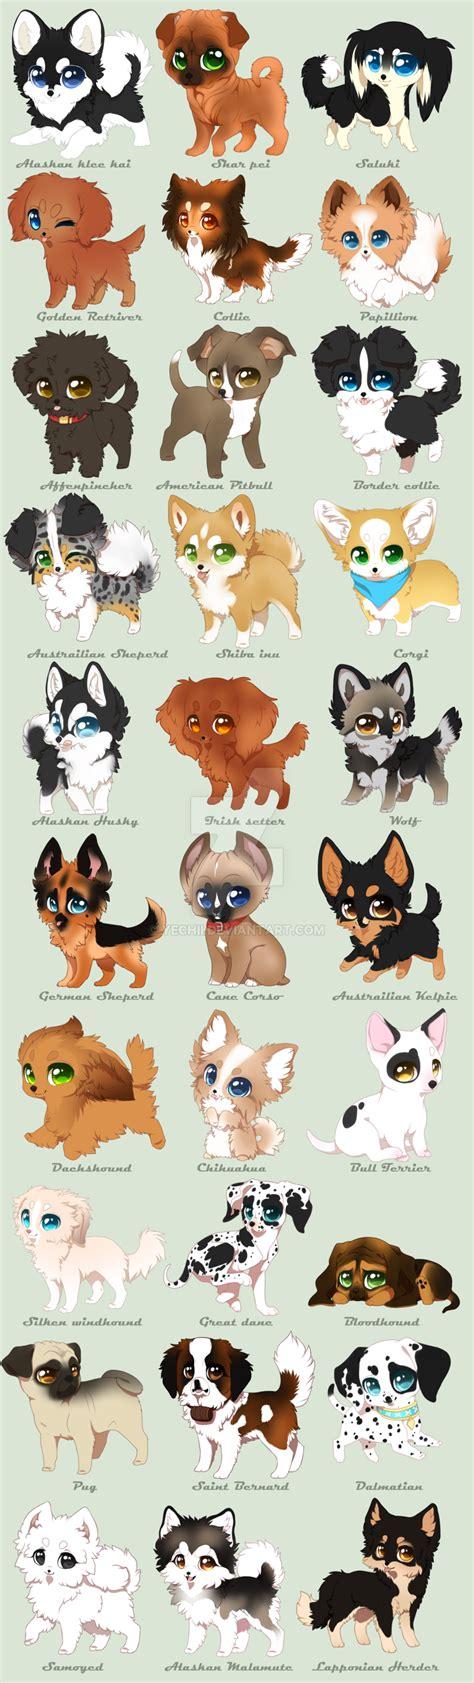 chibi puppy chibi breeds by yechii on deviantart